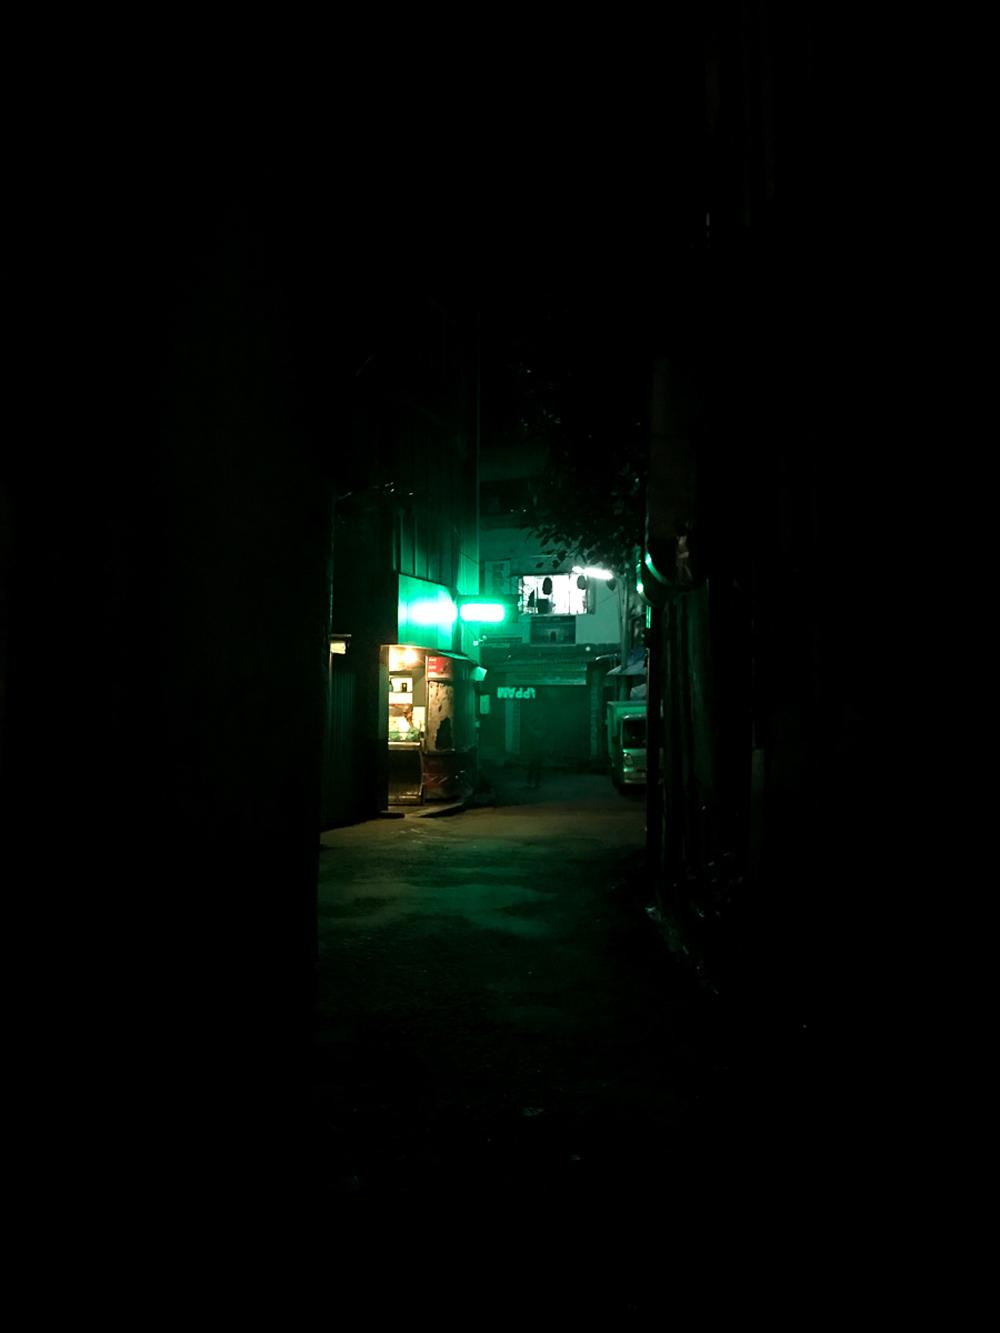 Sri Lanka Kandy Rue Nuit Lumière